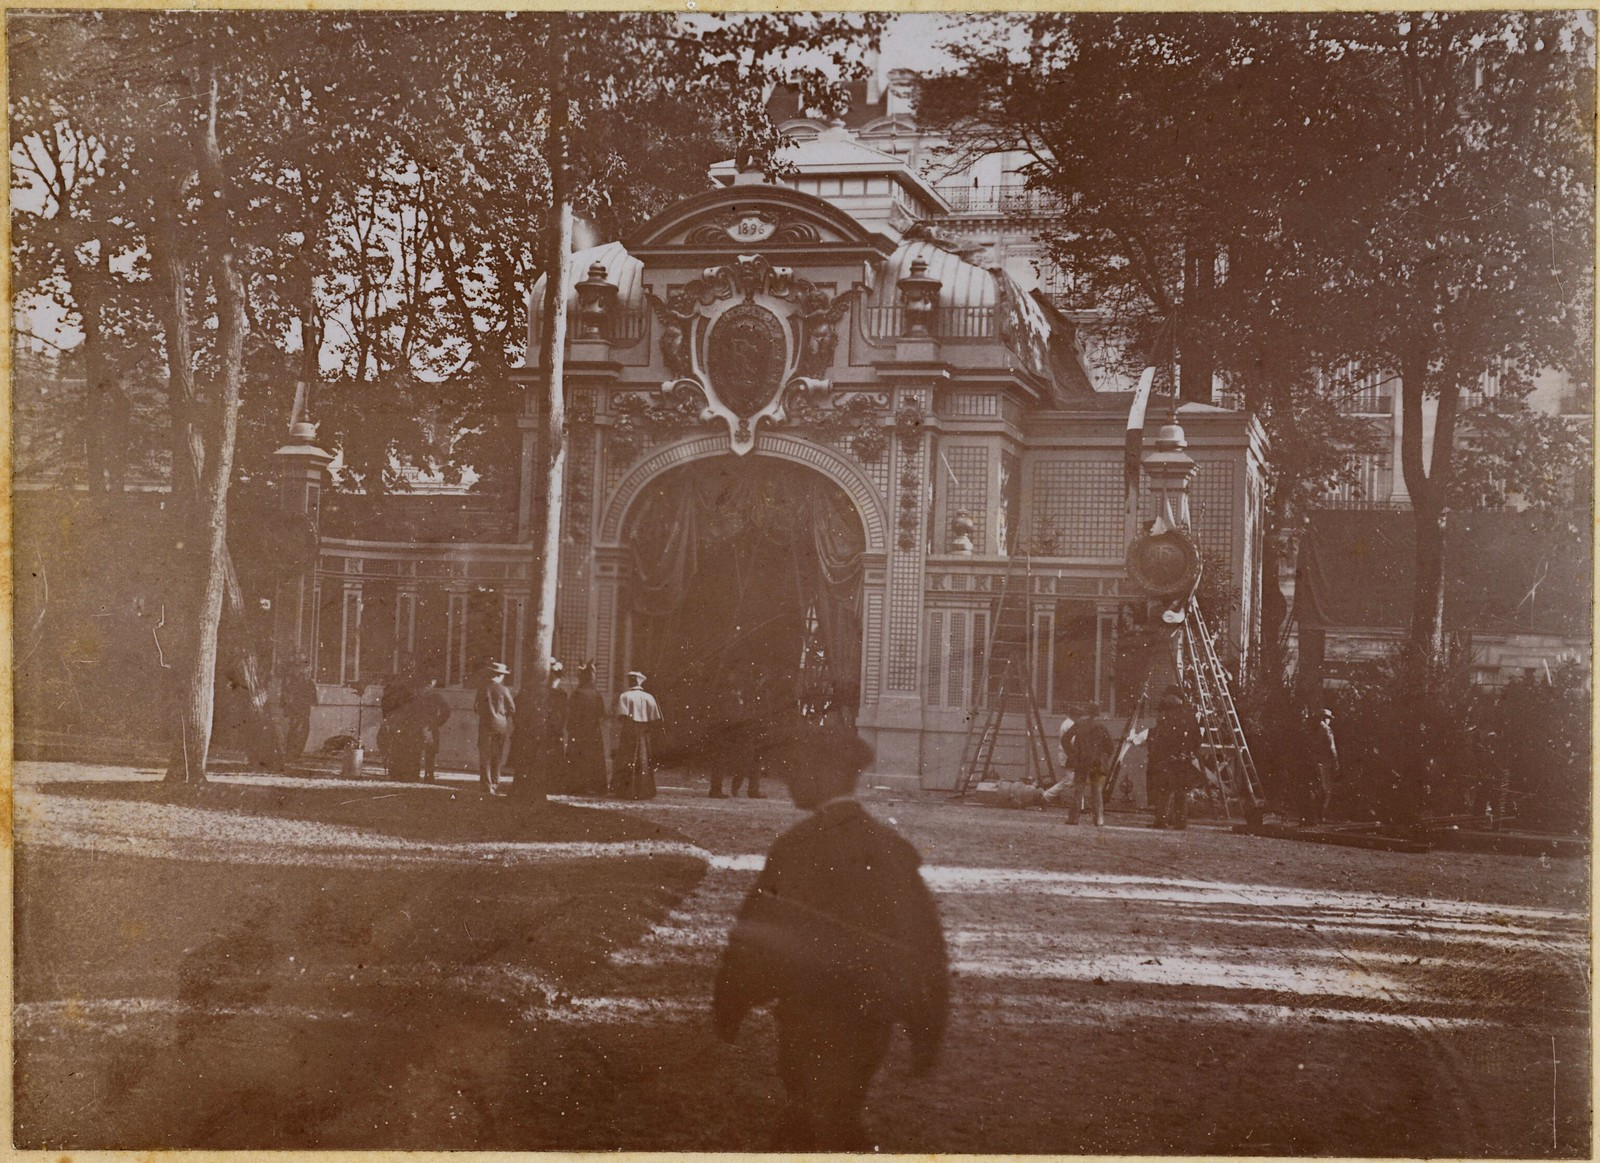 12. Porte Monumentale